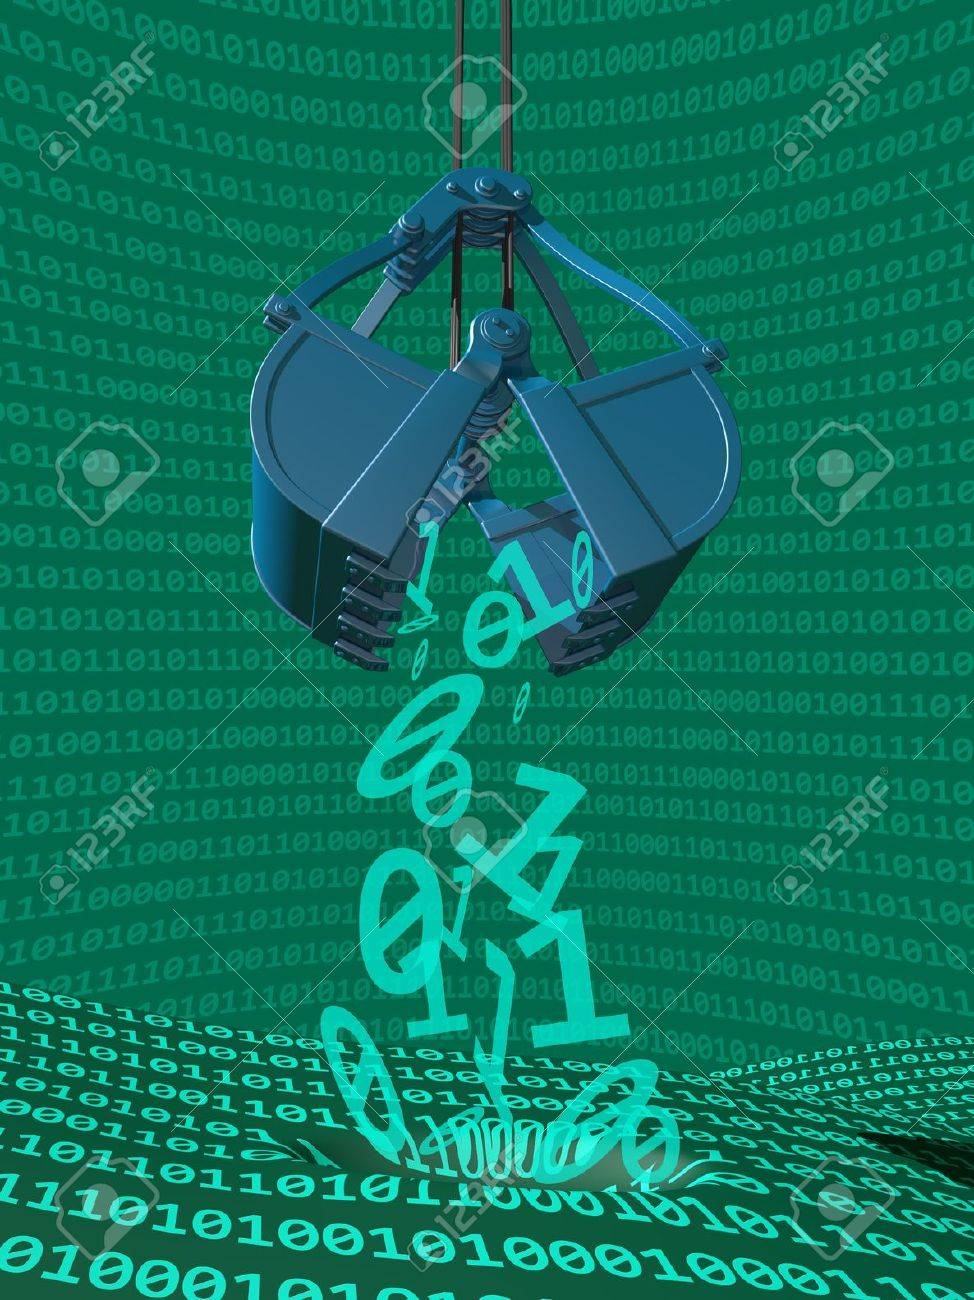 Illustration depicting data mining of computer information Stock Photo - 18496817